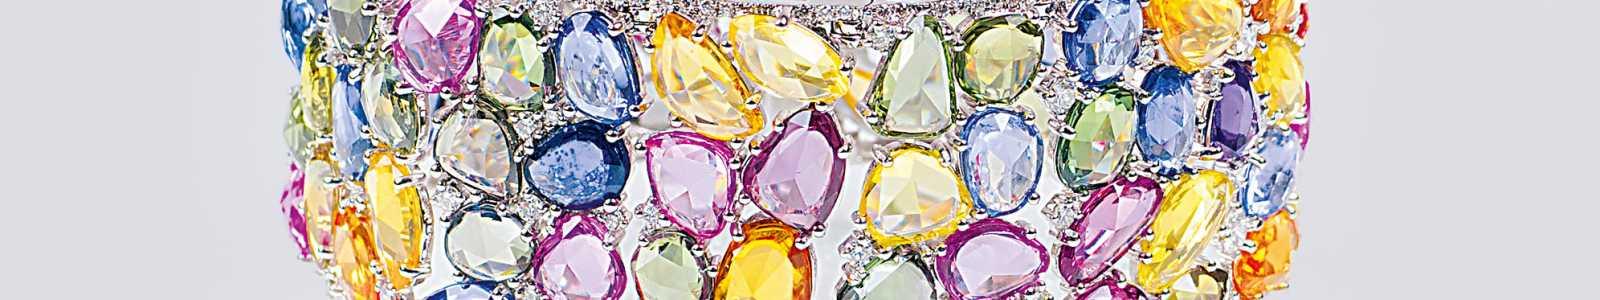 Jewelry and jewels